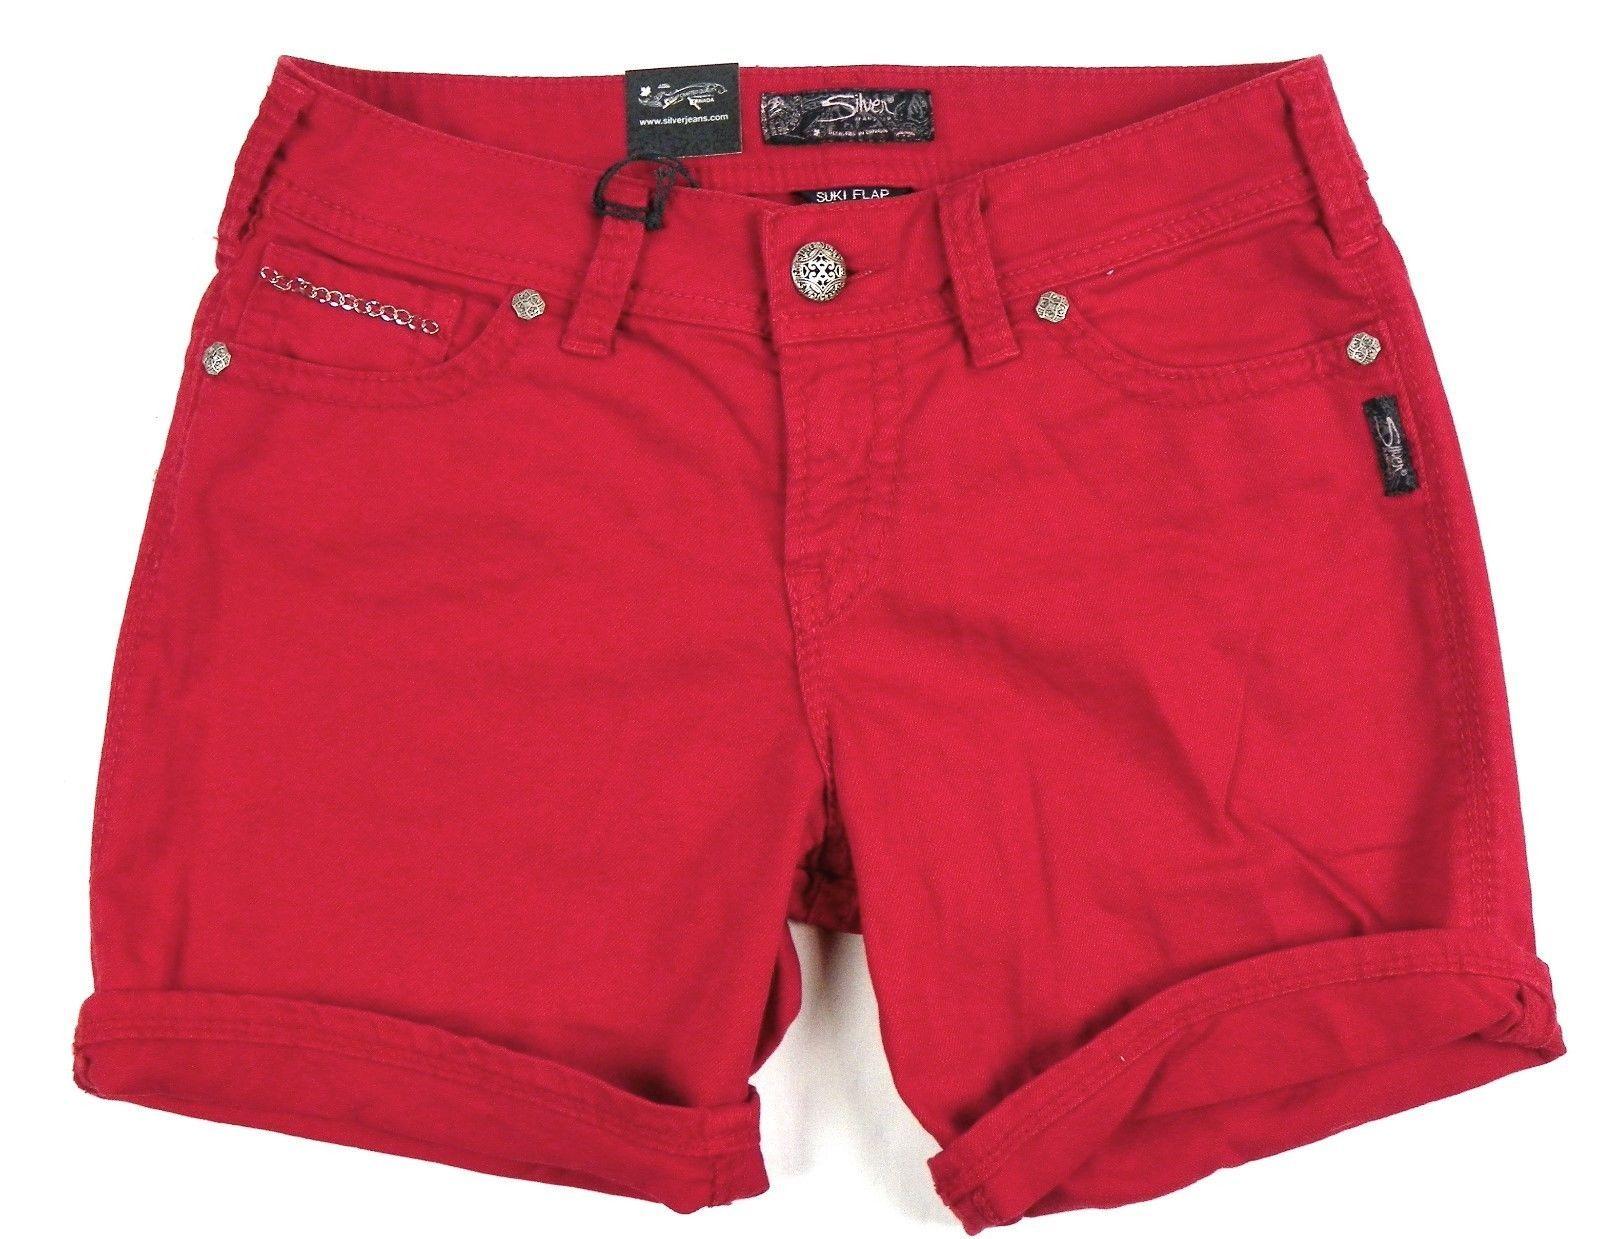 Silver Jeans Co. Shorts Junior Women's SUKI Flap Denim Short Mid-rise Curvy Red